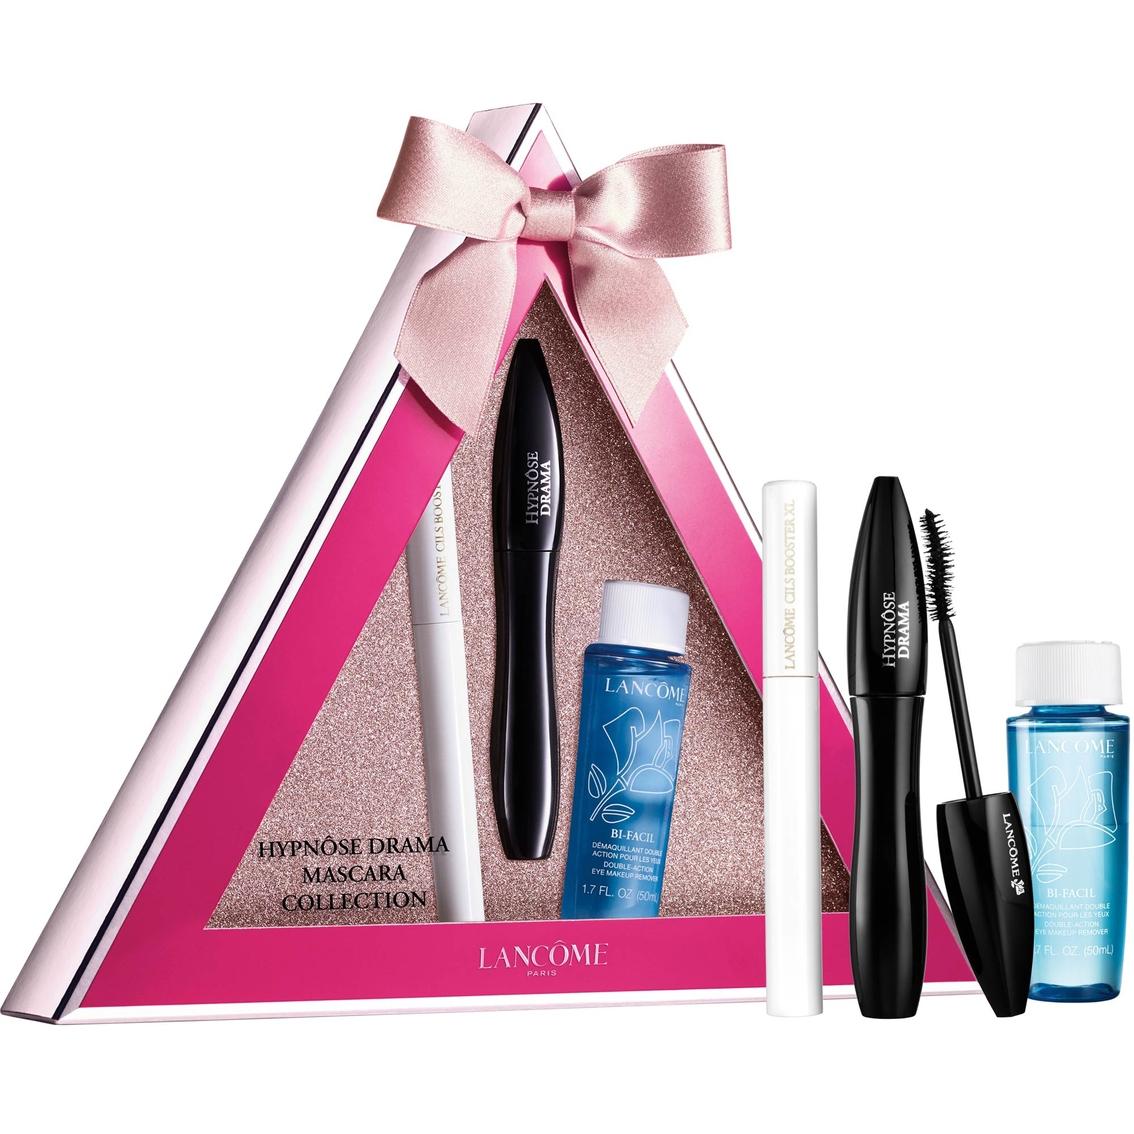 b825bbf87b2 Lancome Hypnose Drama Mascara Set | Mascara | Beauty & Health | Shop ...